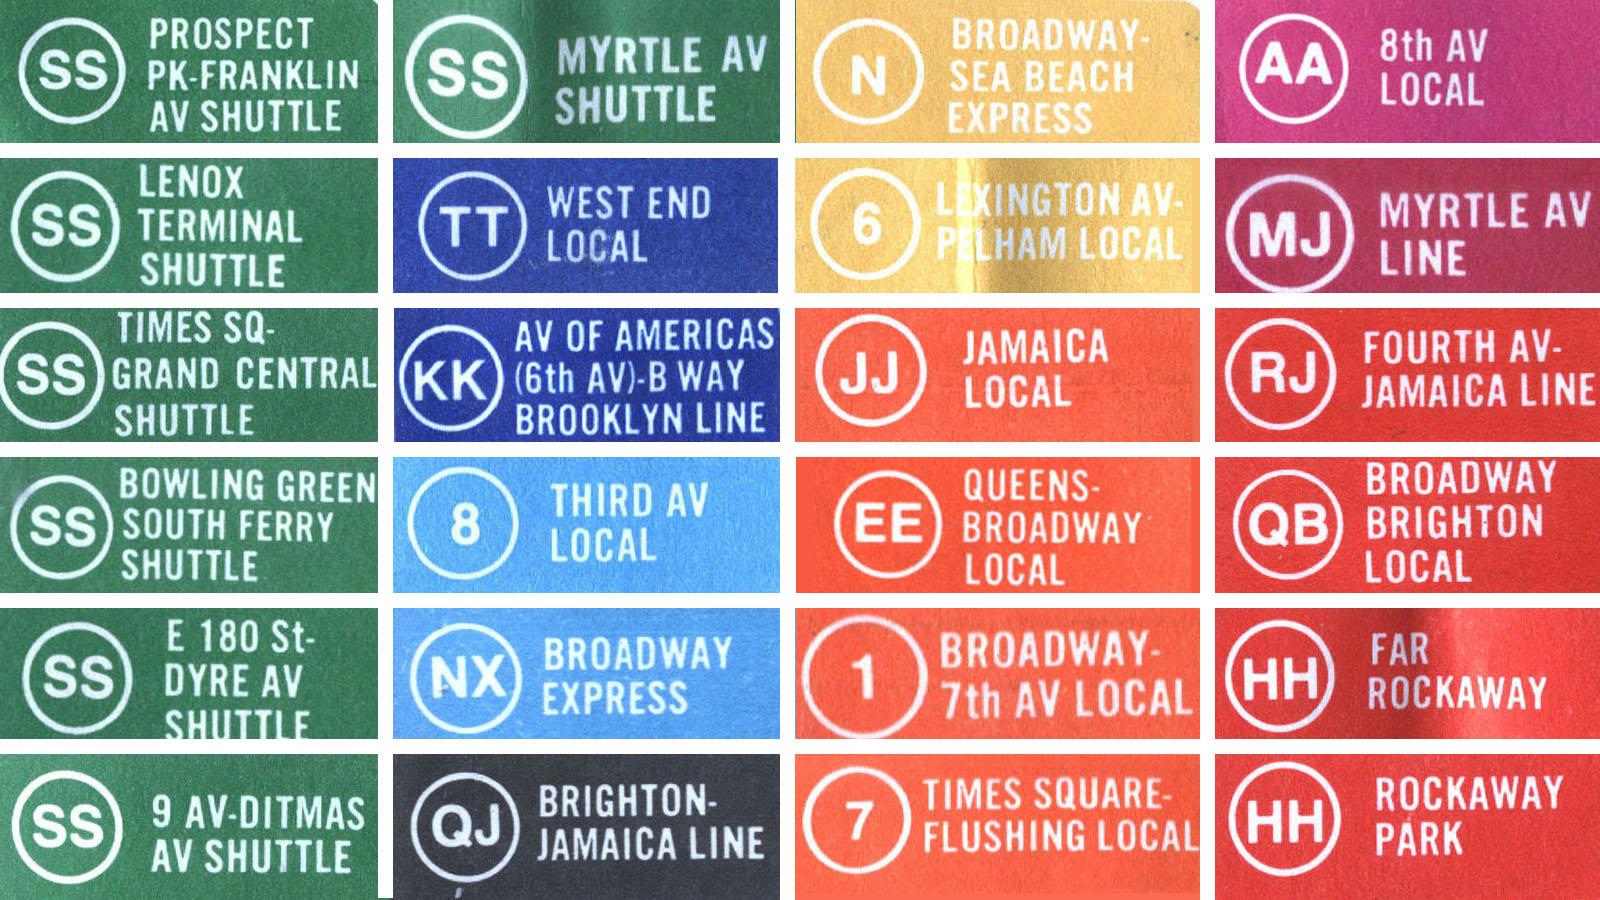 New York Subway Map G Train.The History Behind New York City S Missing Subway Lines Quartz